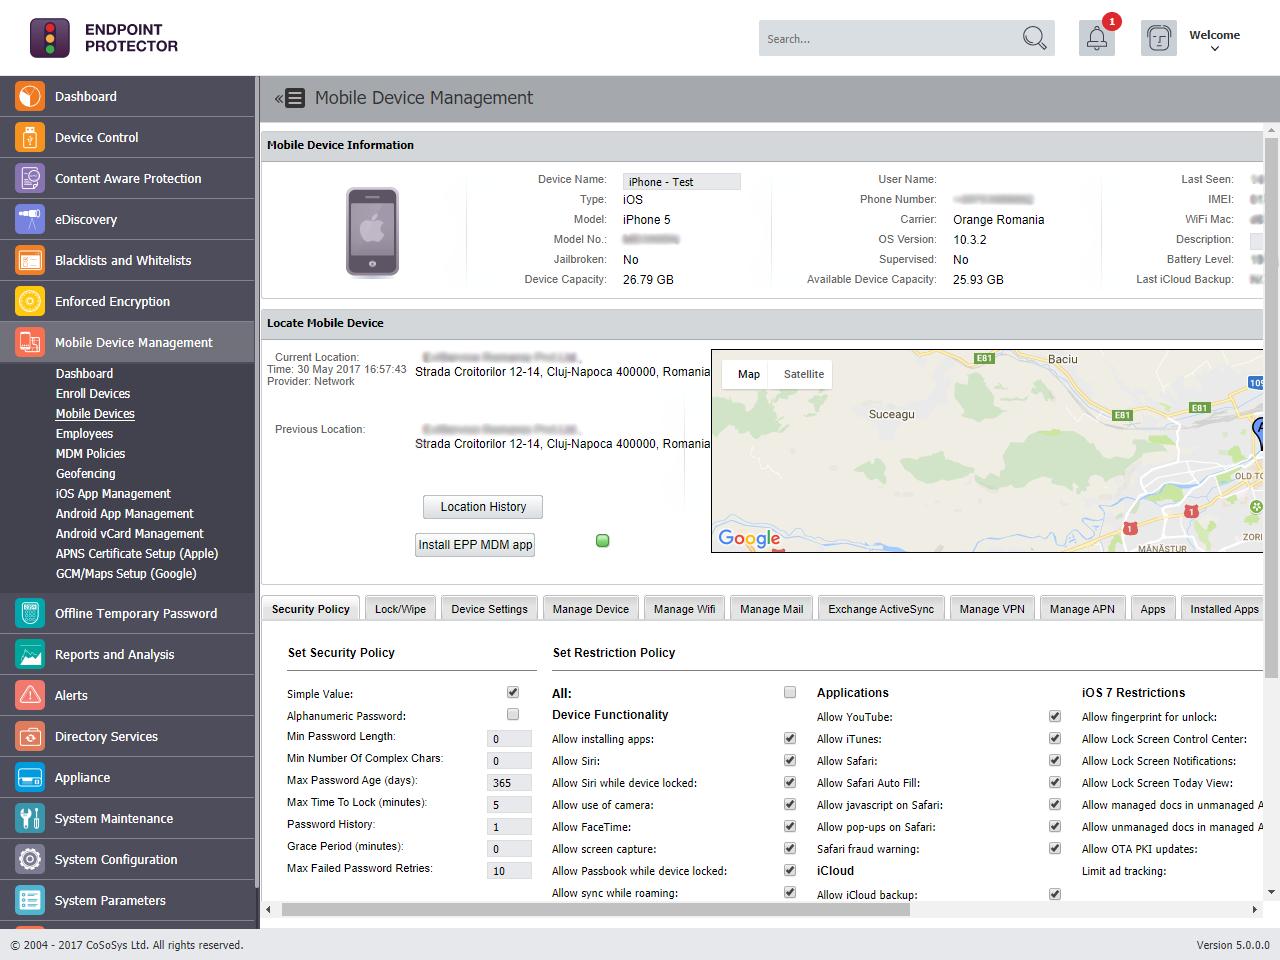 Mobile Device Management - Mobile Device Management